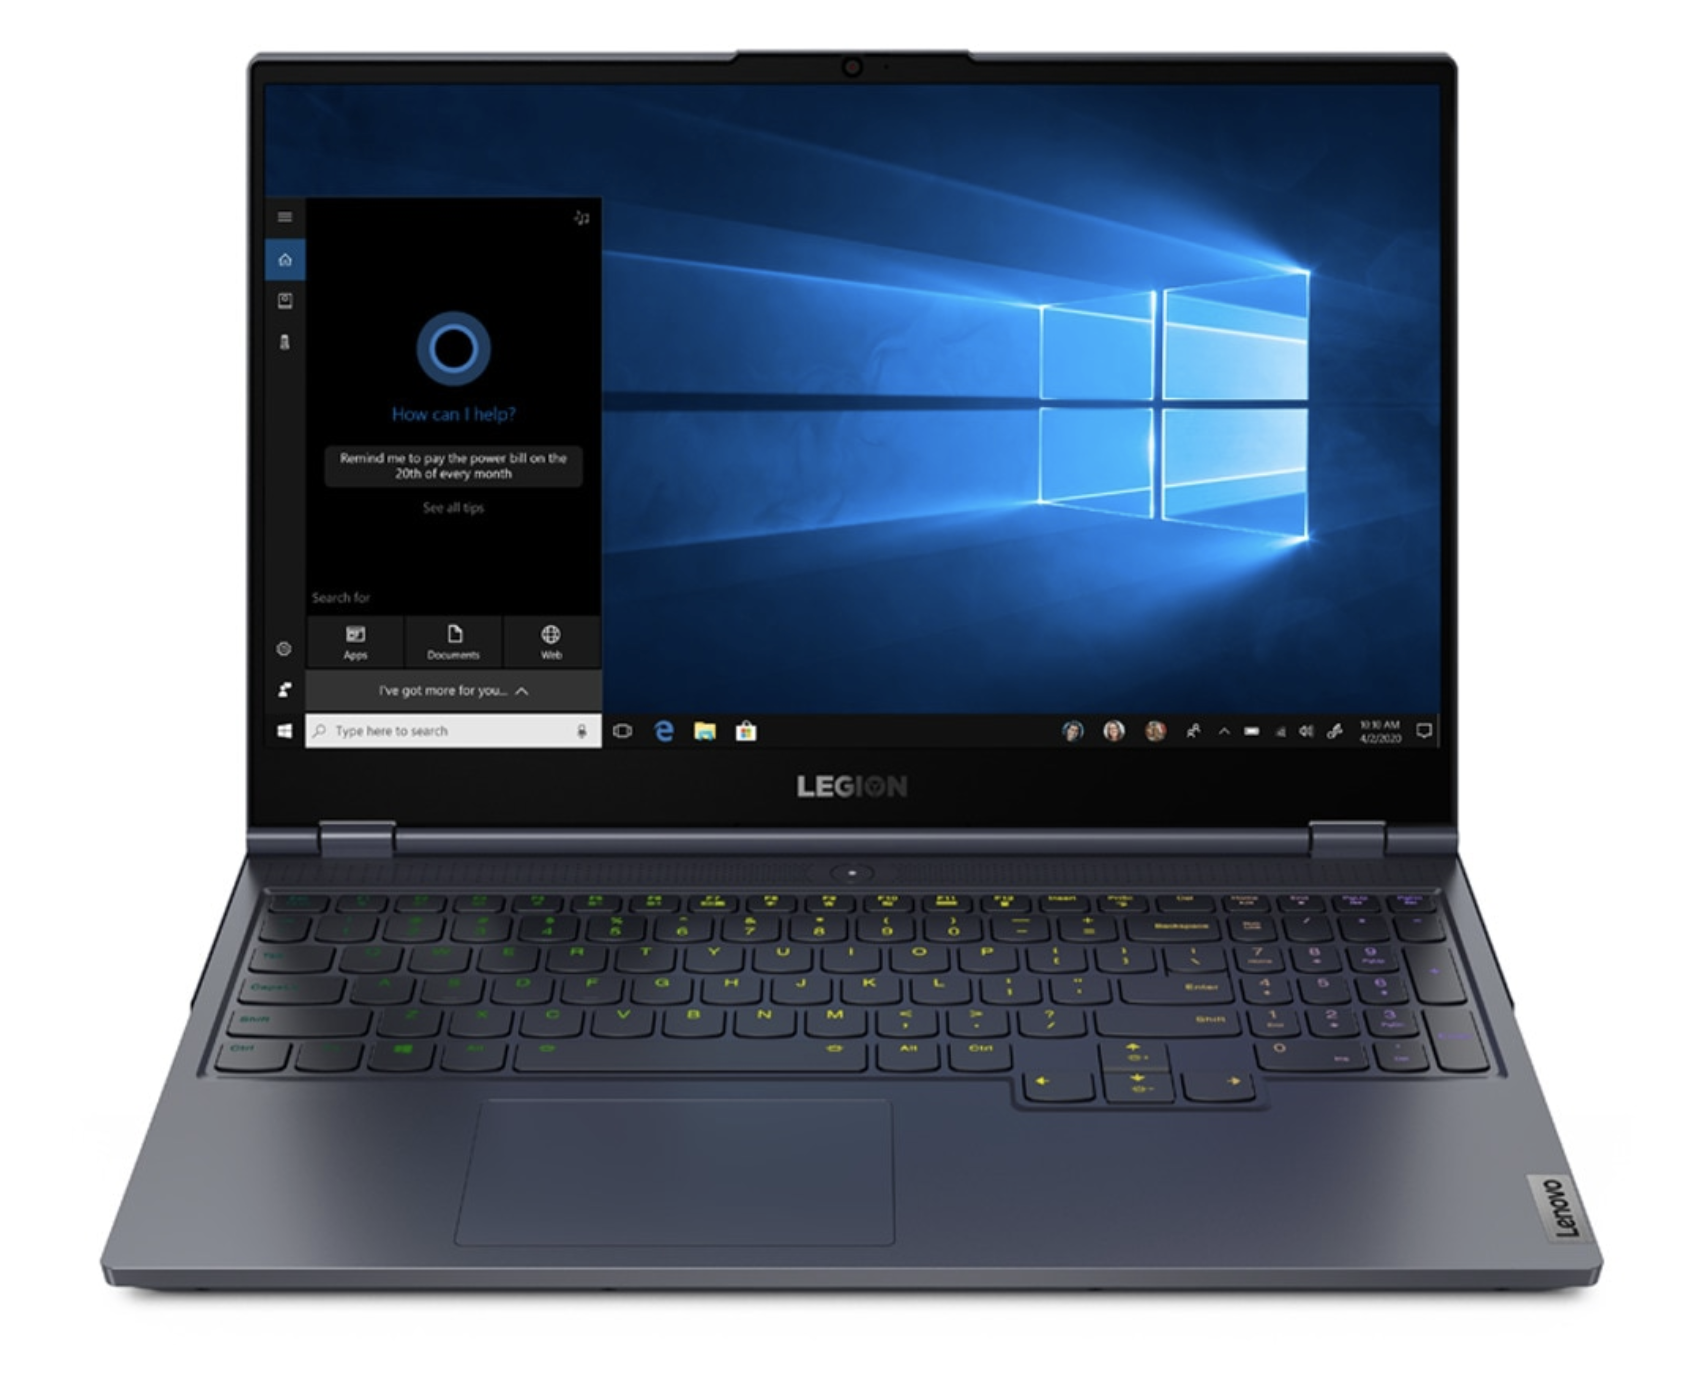 Portátil Gaming Lenovo Legion 7i 15IMH05-5PSP, i7, 16GB, 512GB SSD, GeForce RTX 2070 Max-Q 8GB, FreeDOS / Sin Sistema Operativo